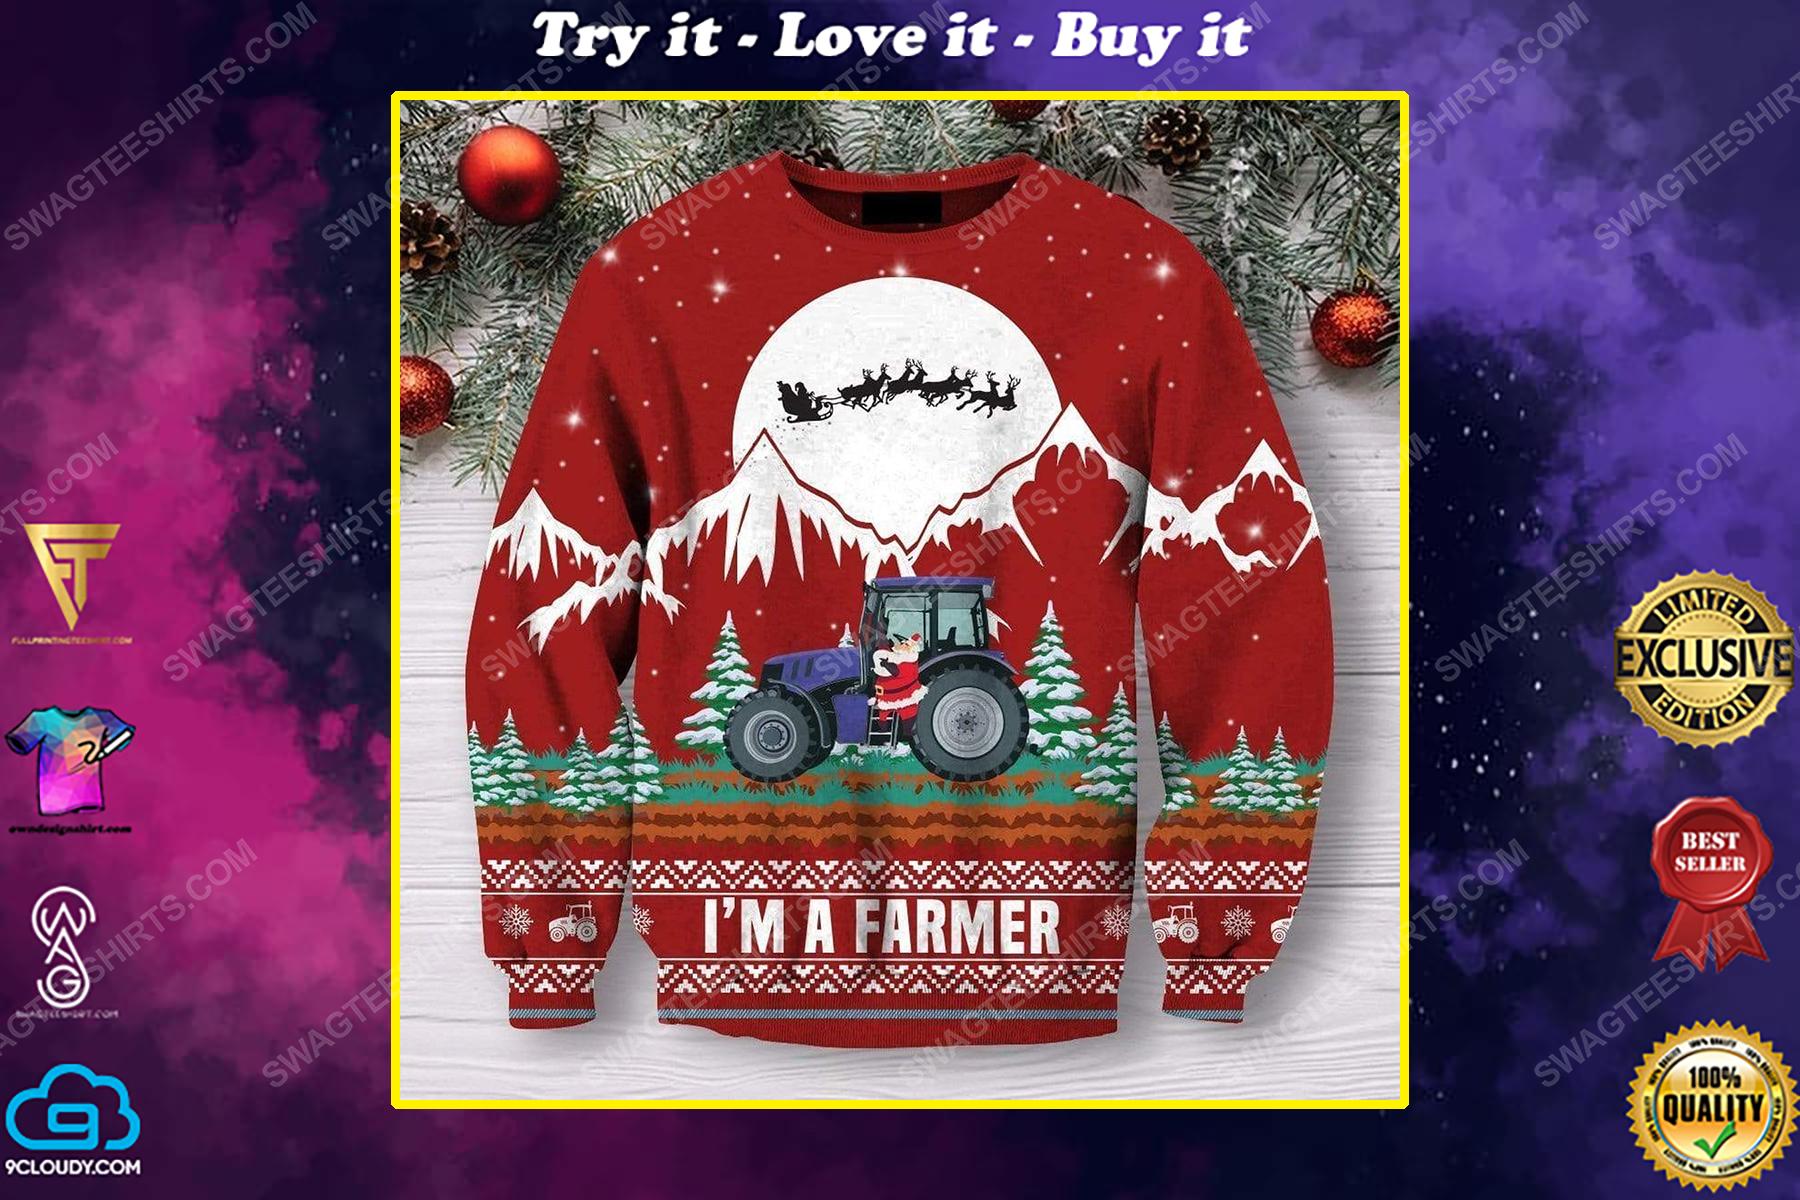 I'm a farmer all over print ugly christmas sweater